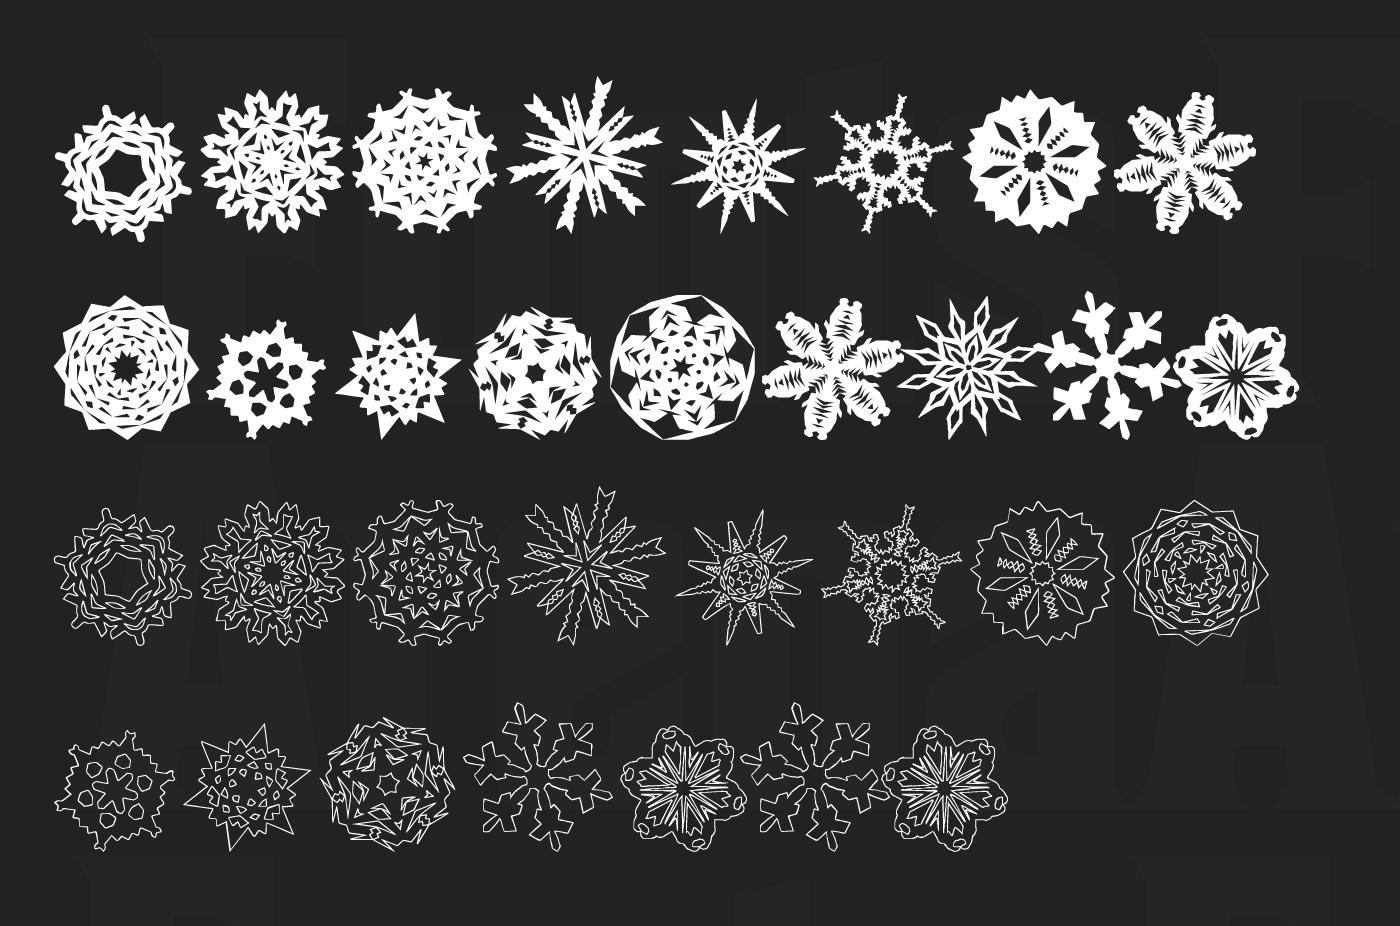 Paper Snowflakes free icon font